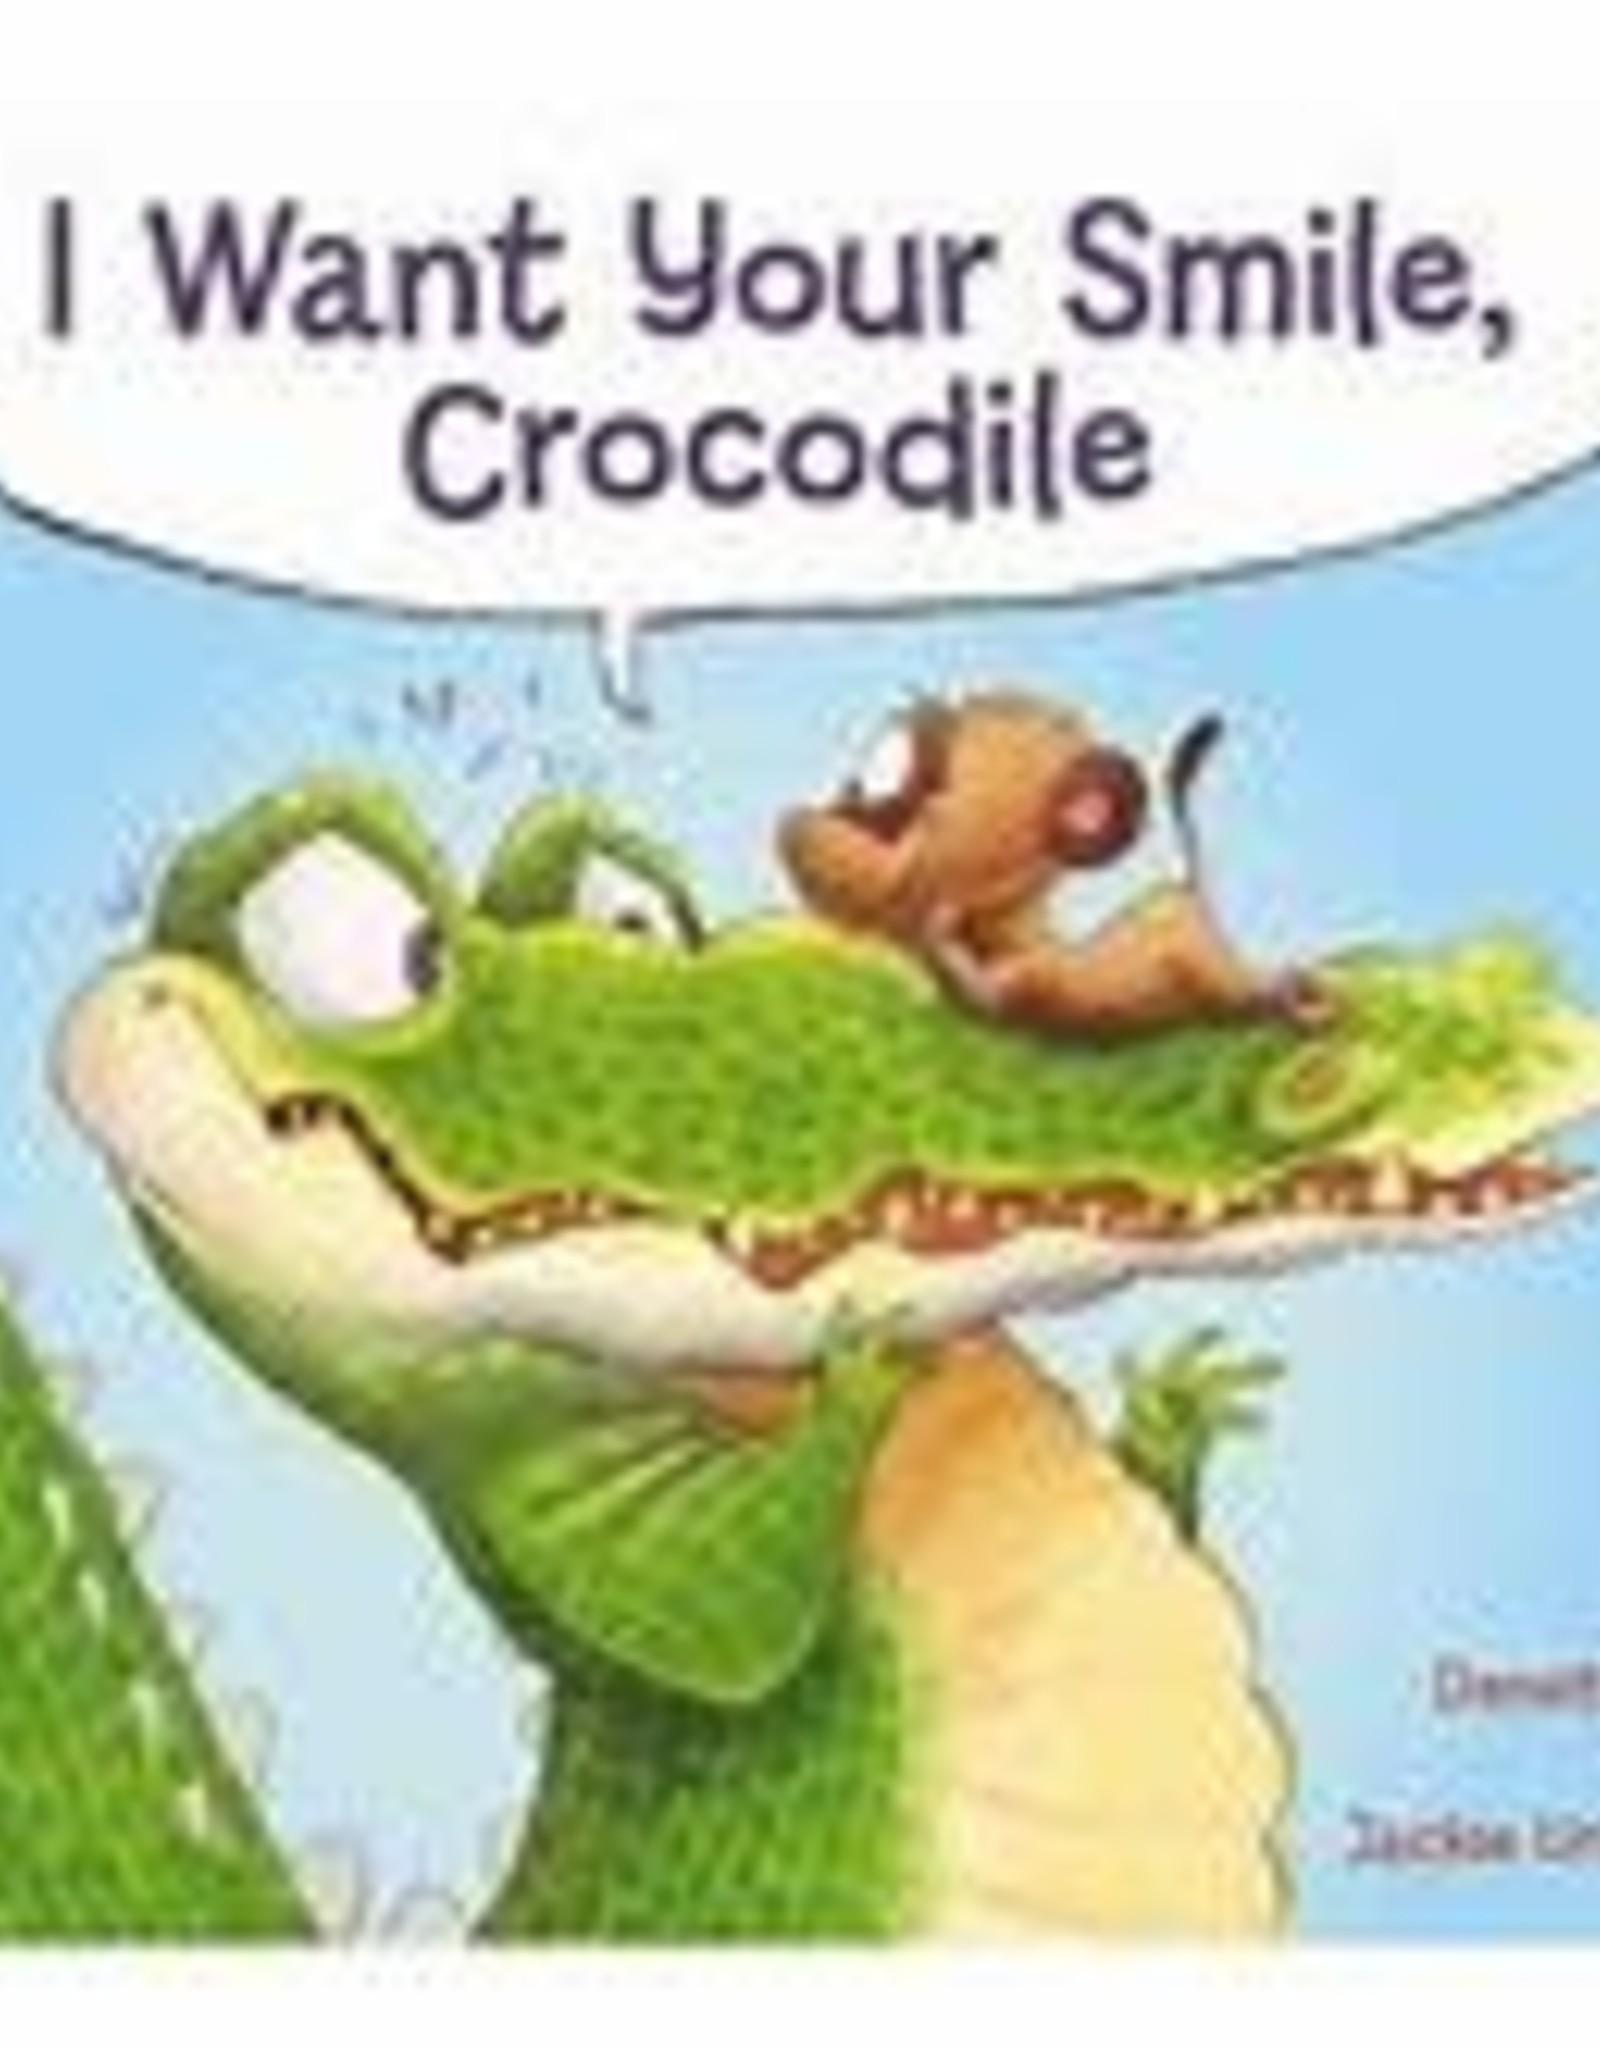 I Want Your Smile Crocodile